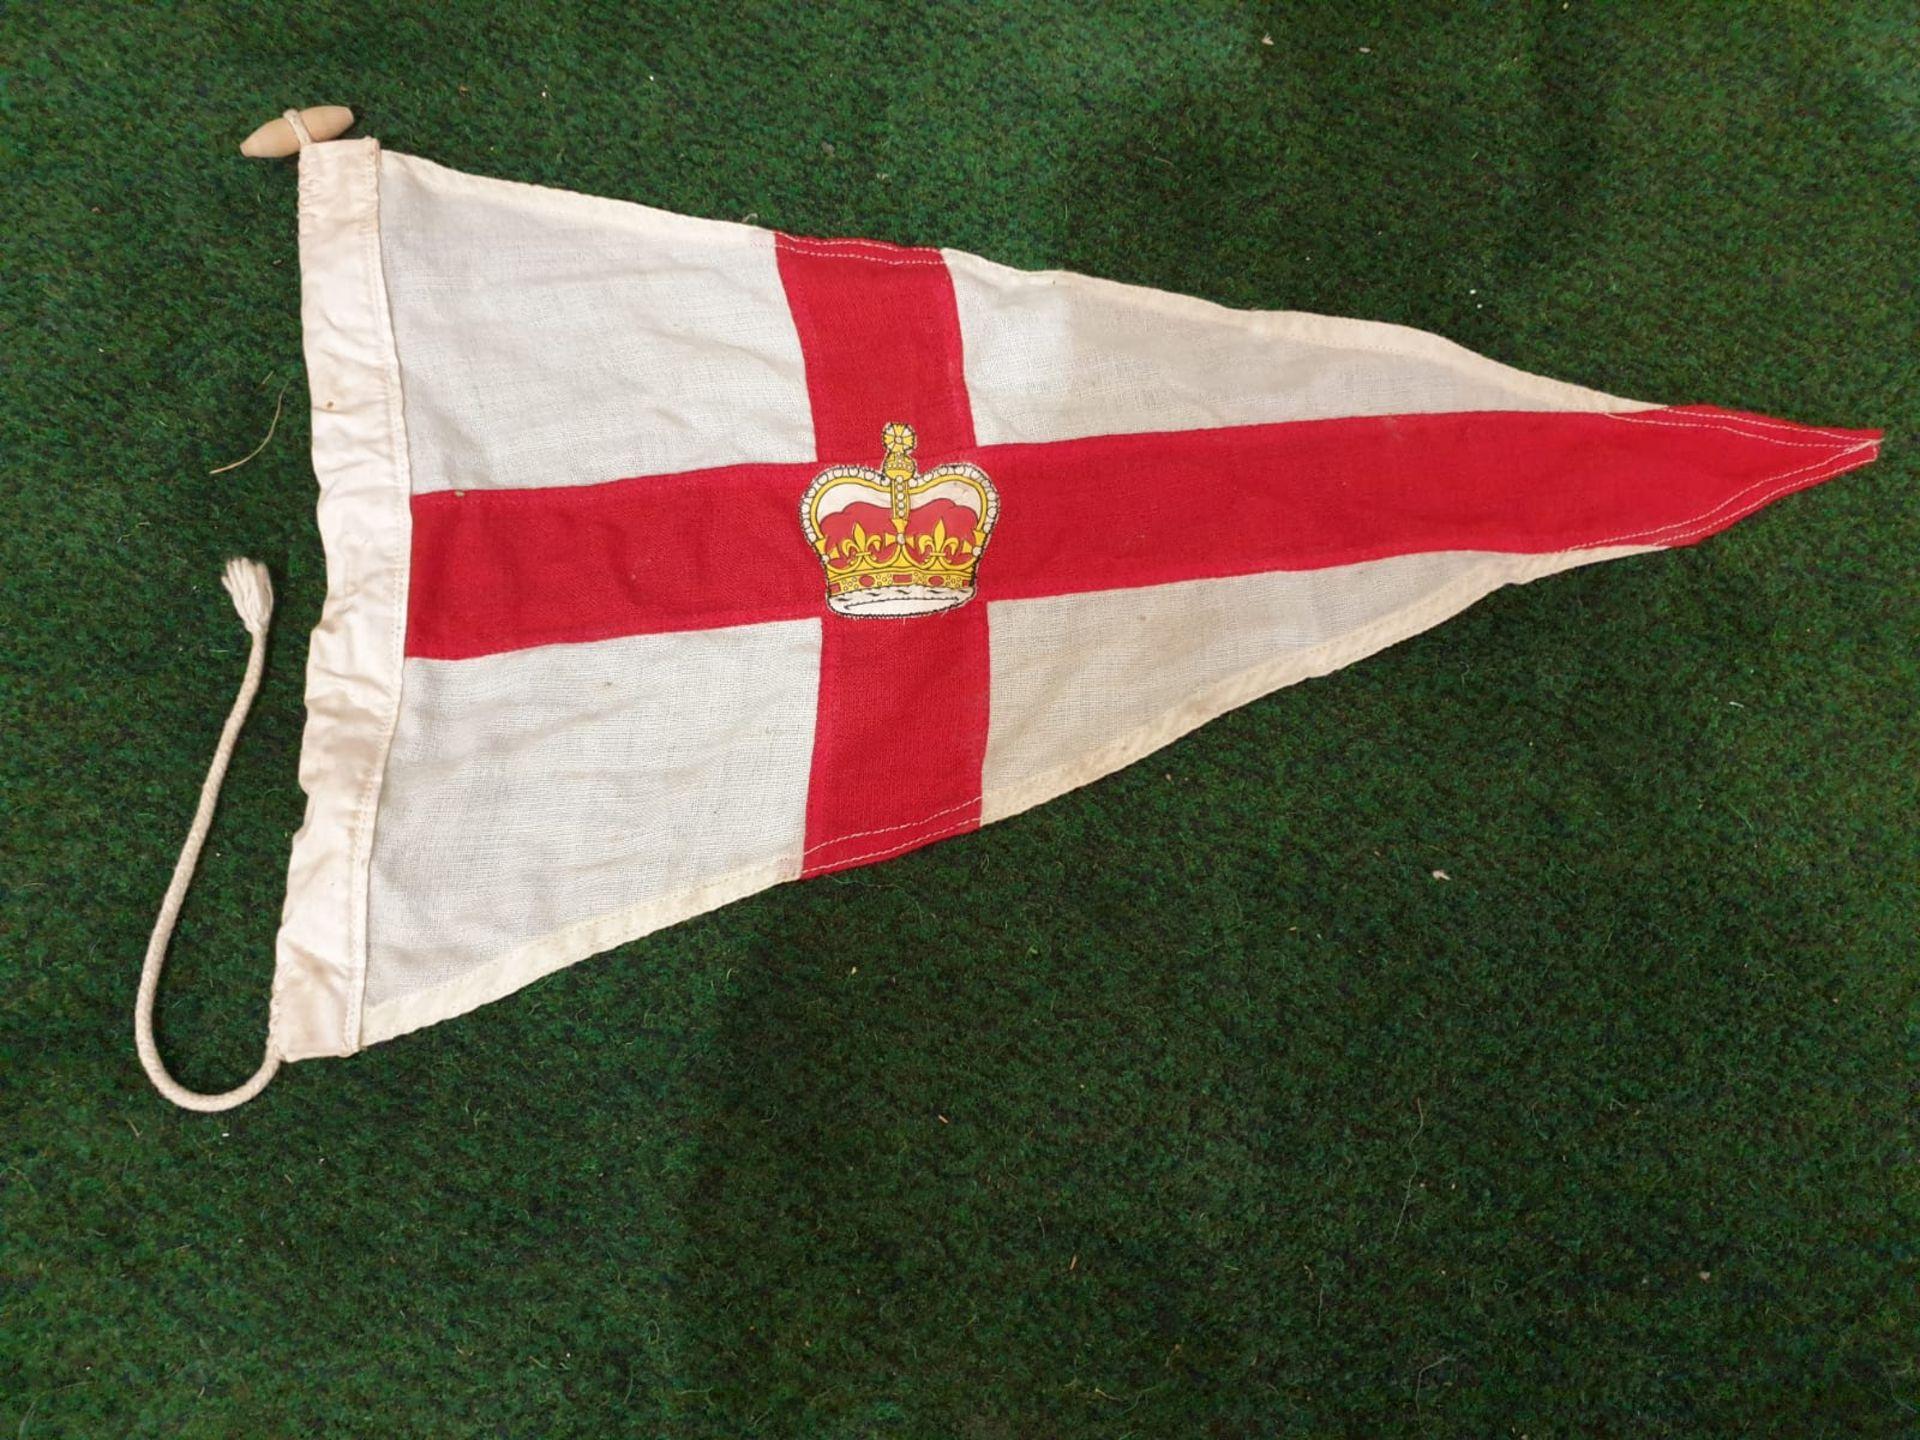 Vintage St Georges pennon flag - Image 2 of 2